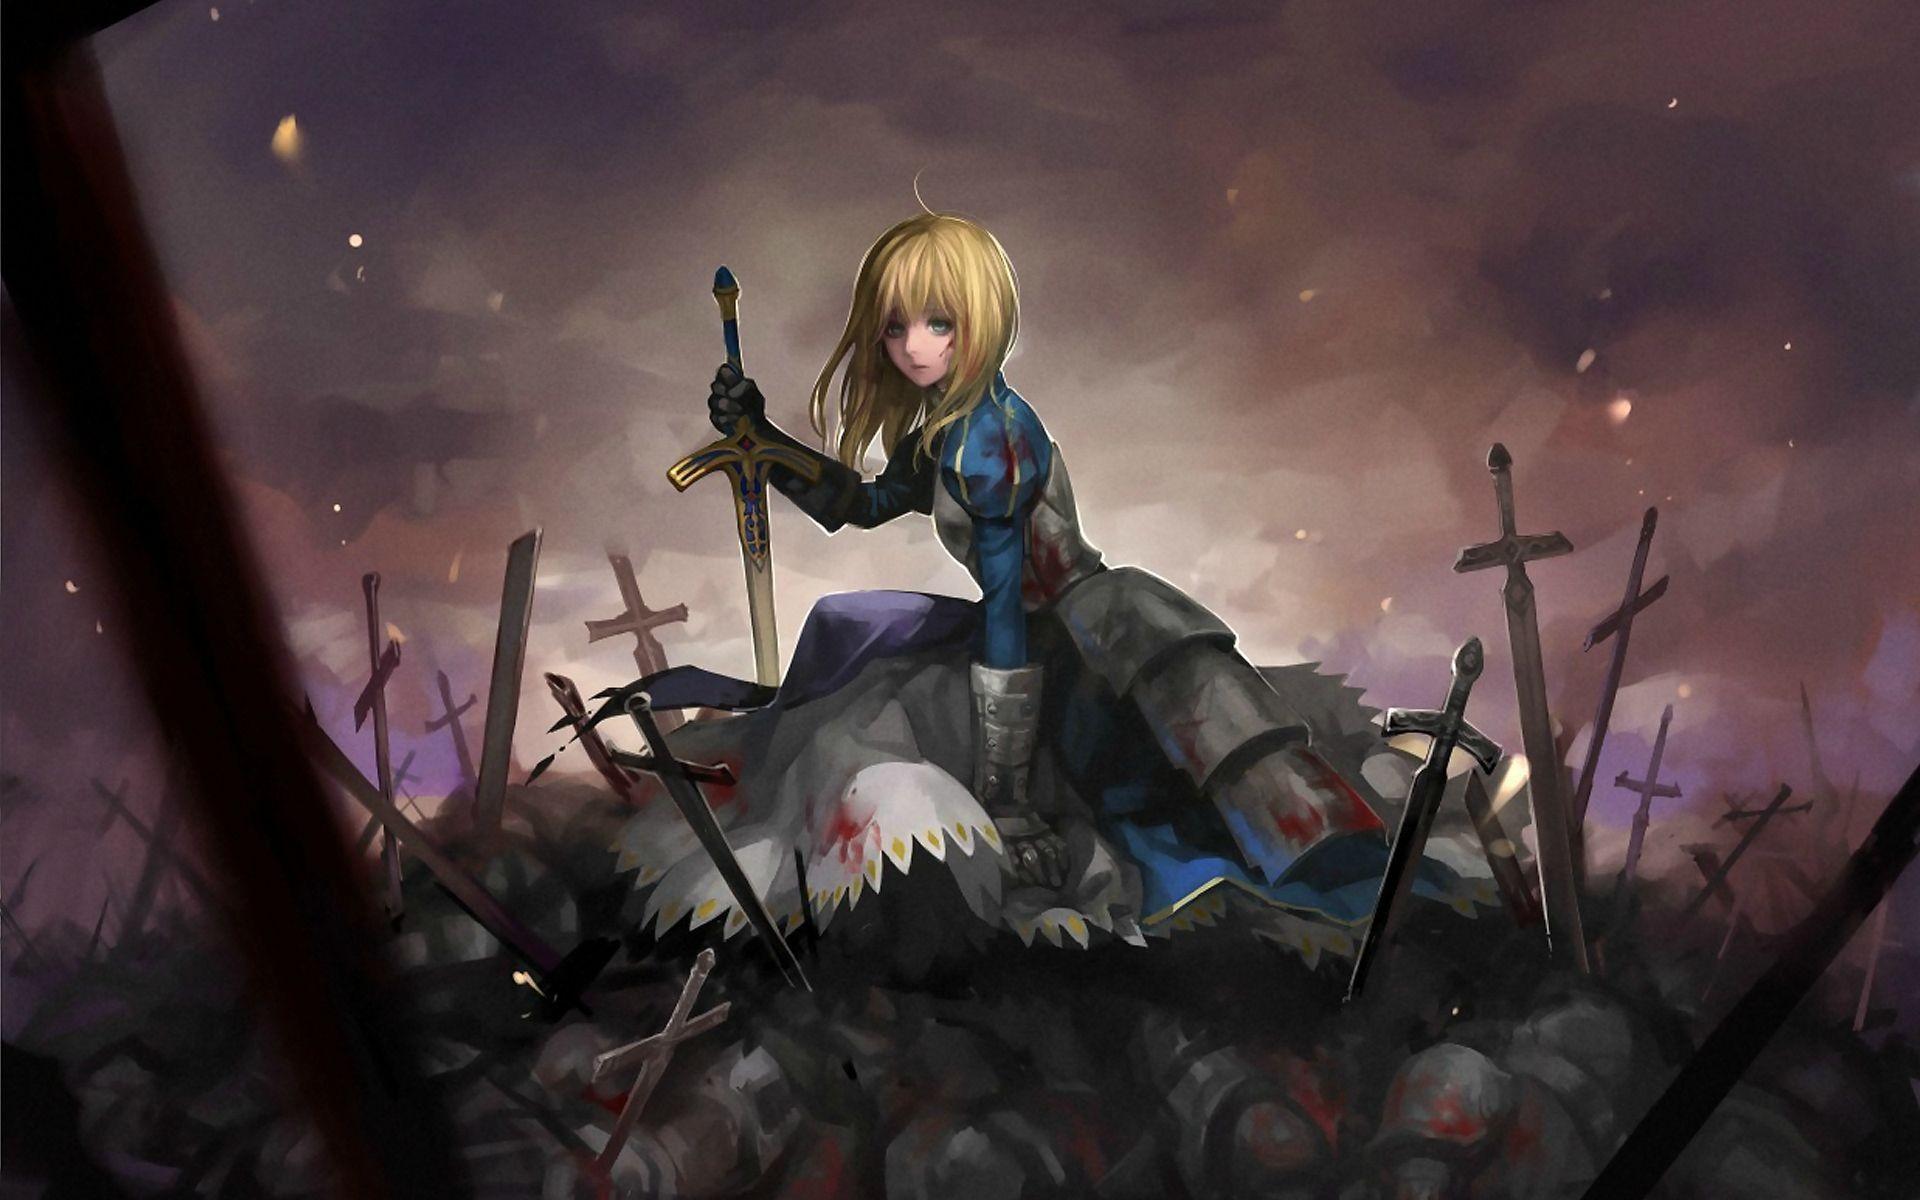 blondes anime girls imgur wallpaper 1920x1200 230243